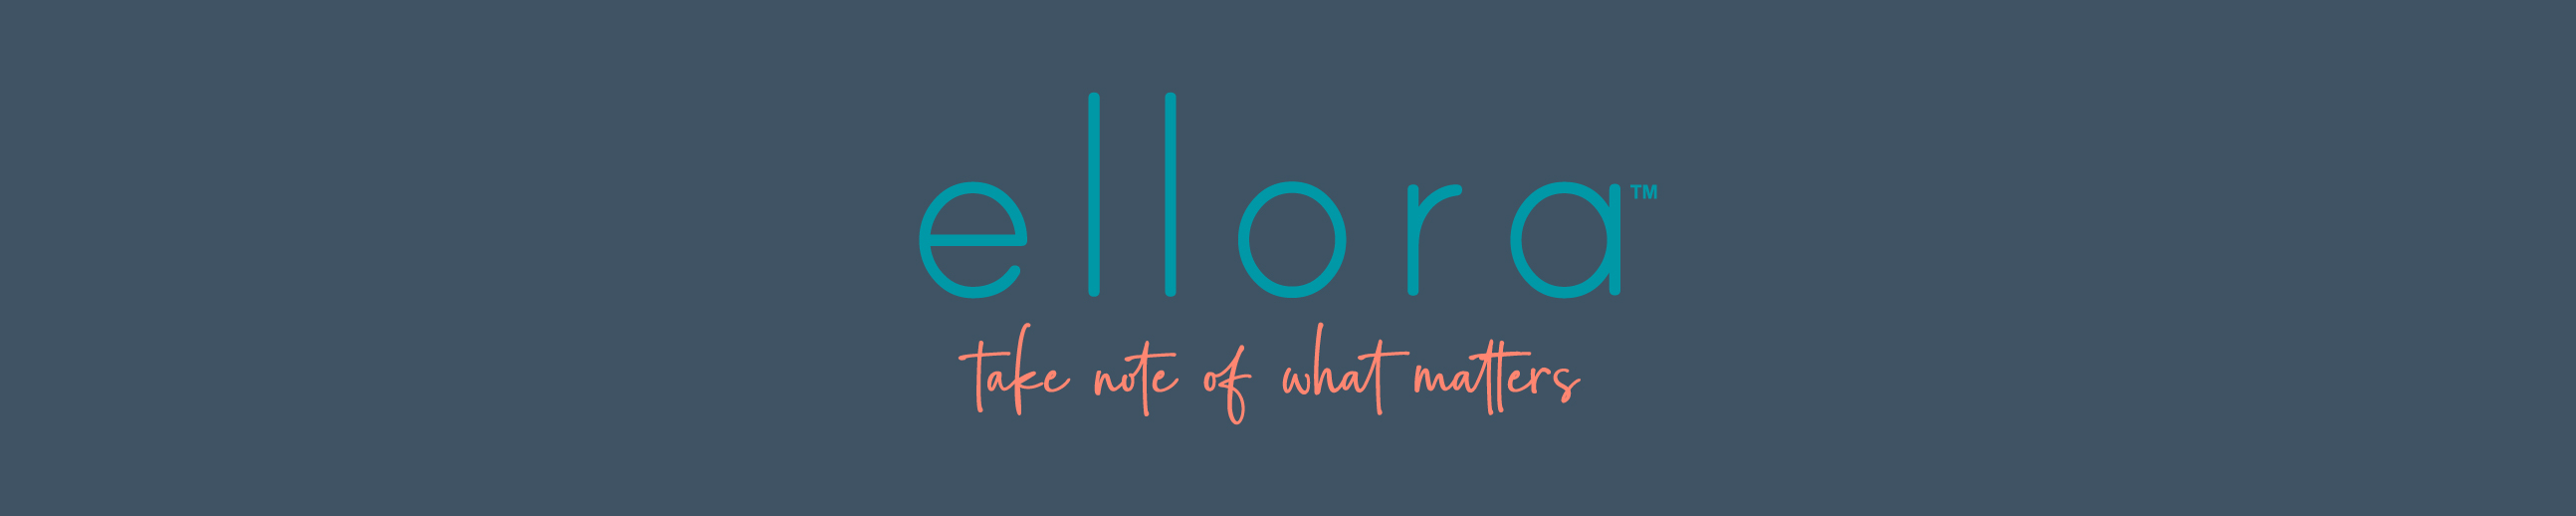 Ellora, Keepsake Cards Collection, Jewelry, Accessories, Wholesale Boutique, Myrtle Beach, SC, USA